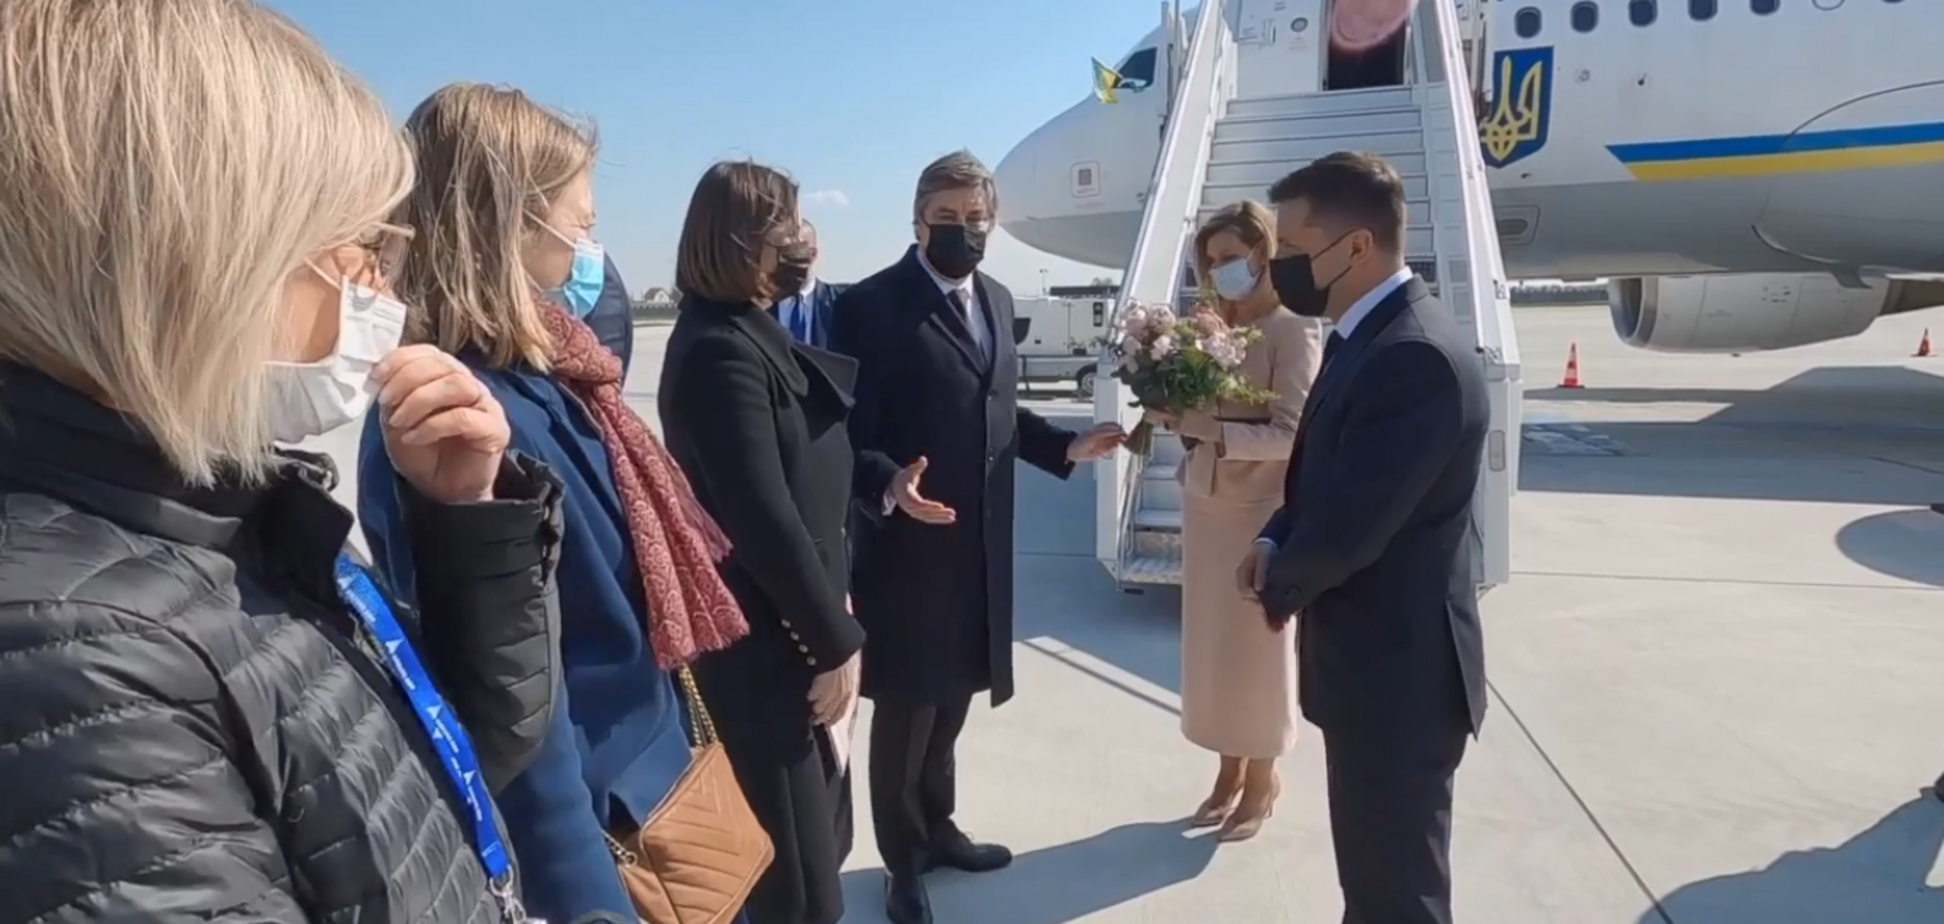 Президент України Володимир Зеленський та перша леді Олена Зеленська